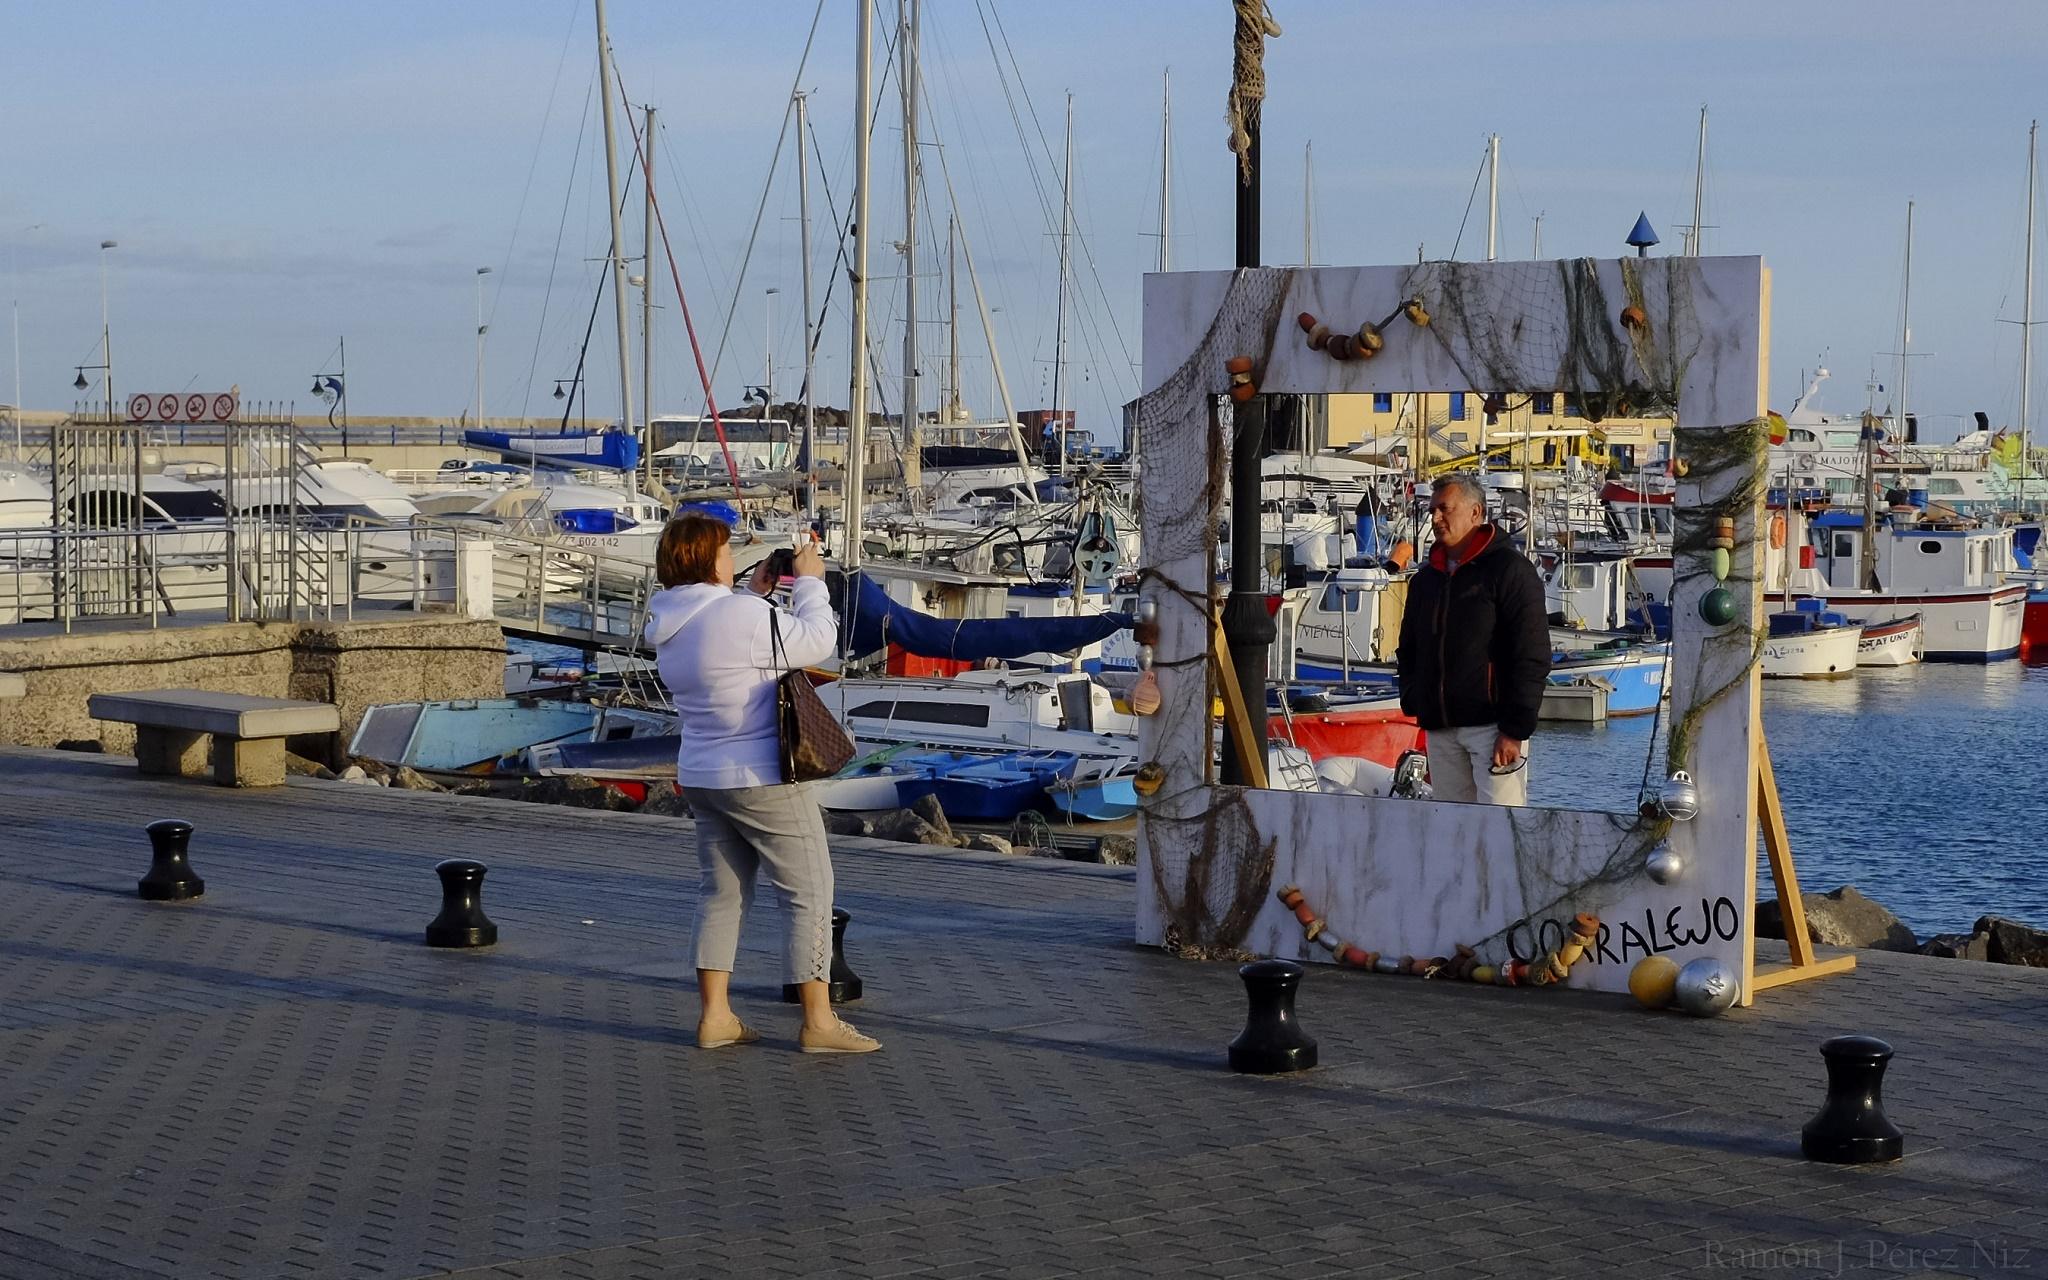 Turistas posando en Photo Call de Corralejo, Fuerteventura